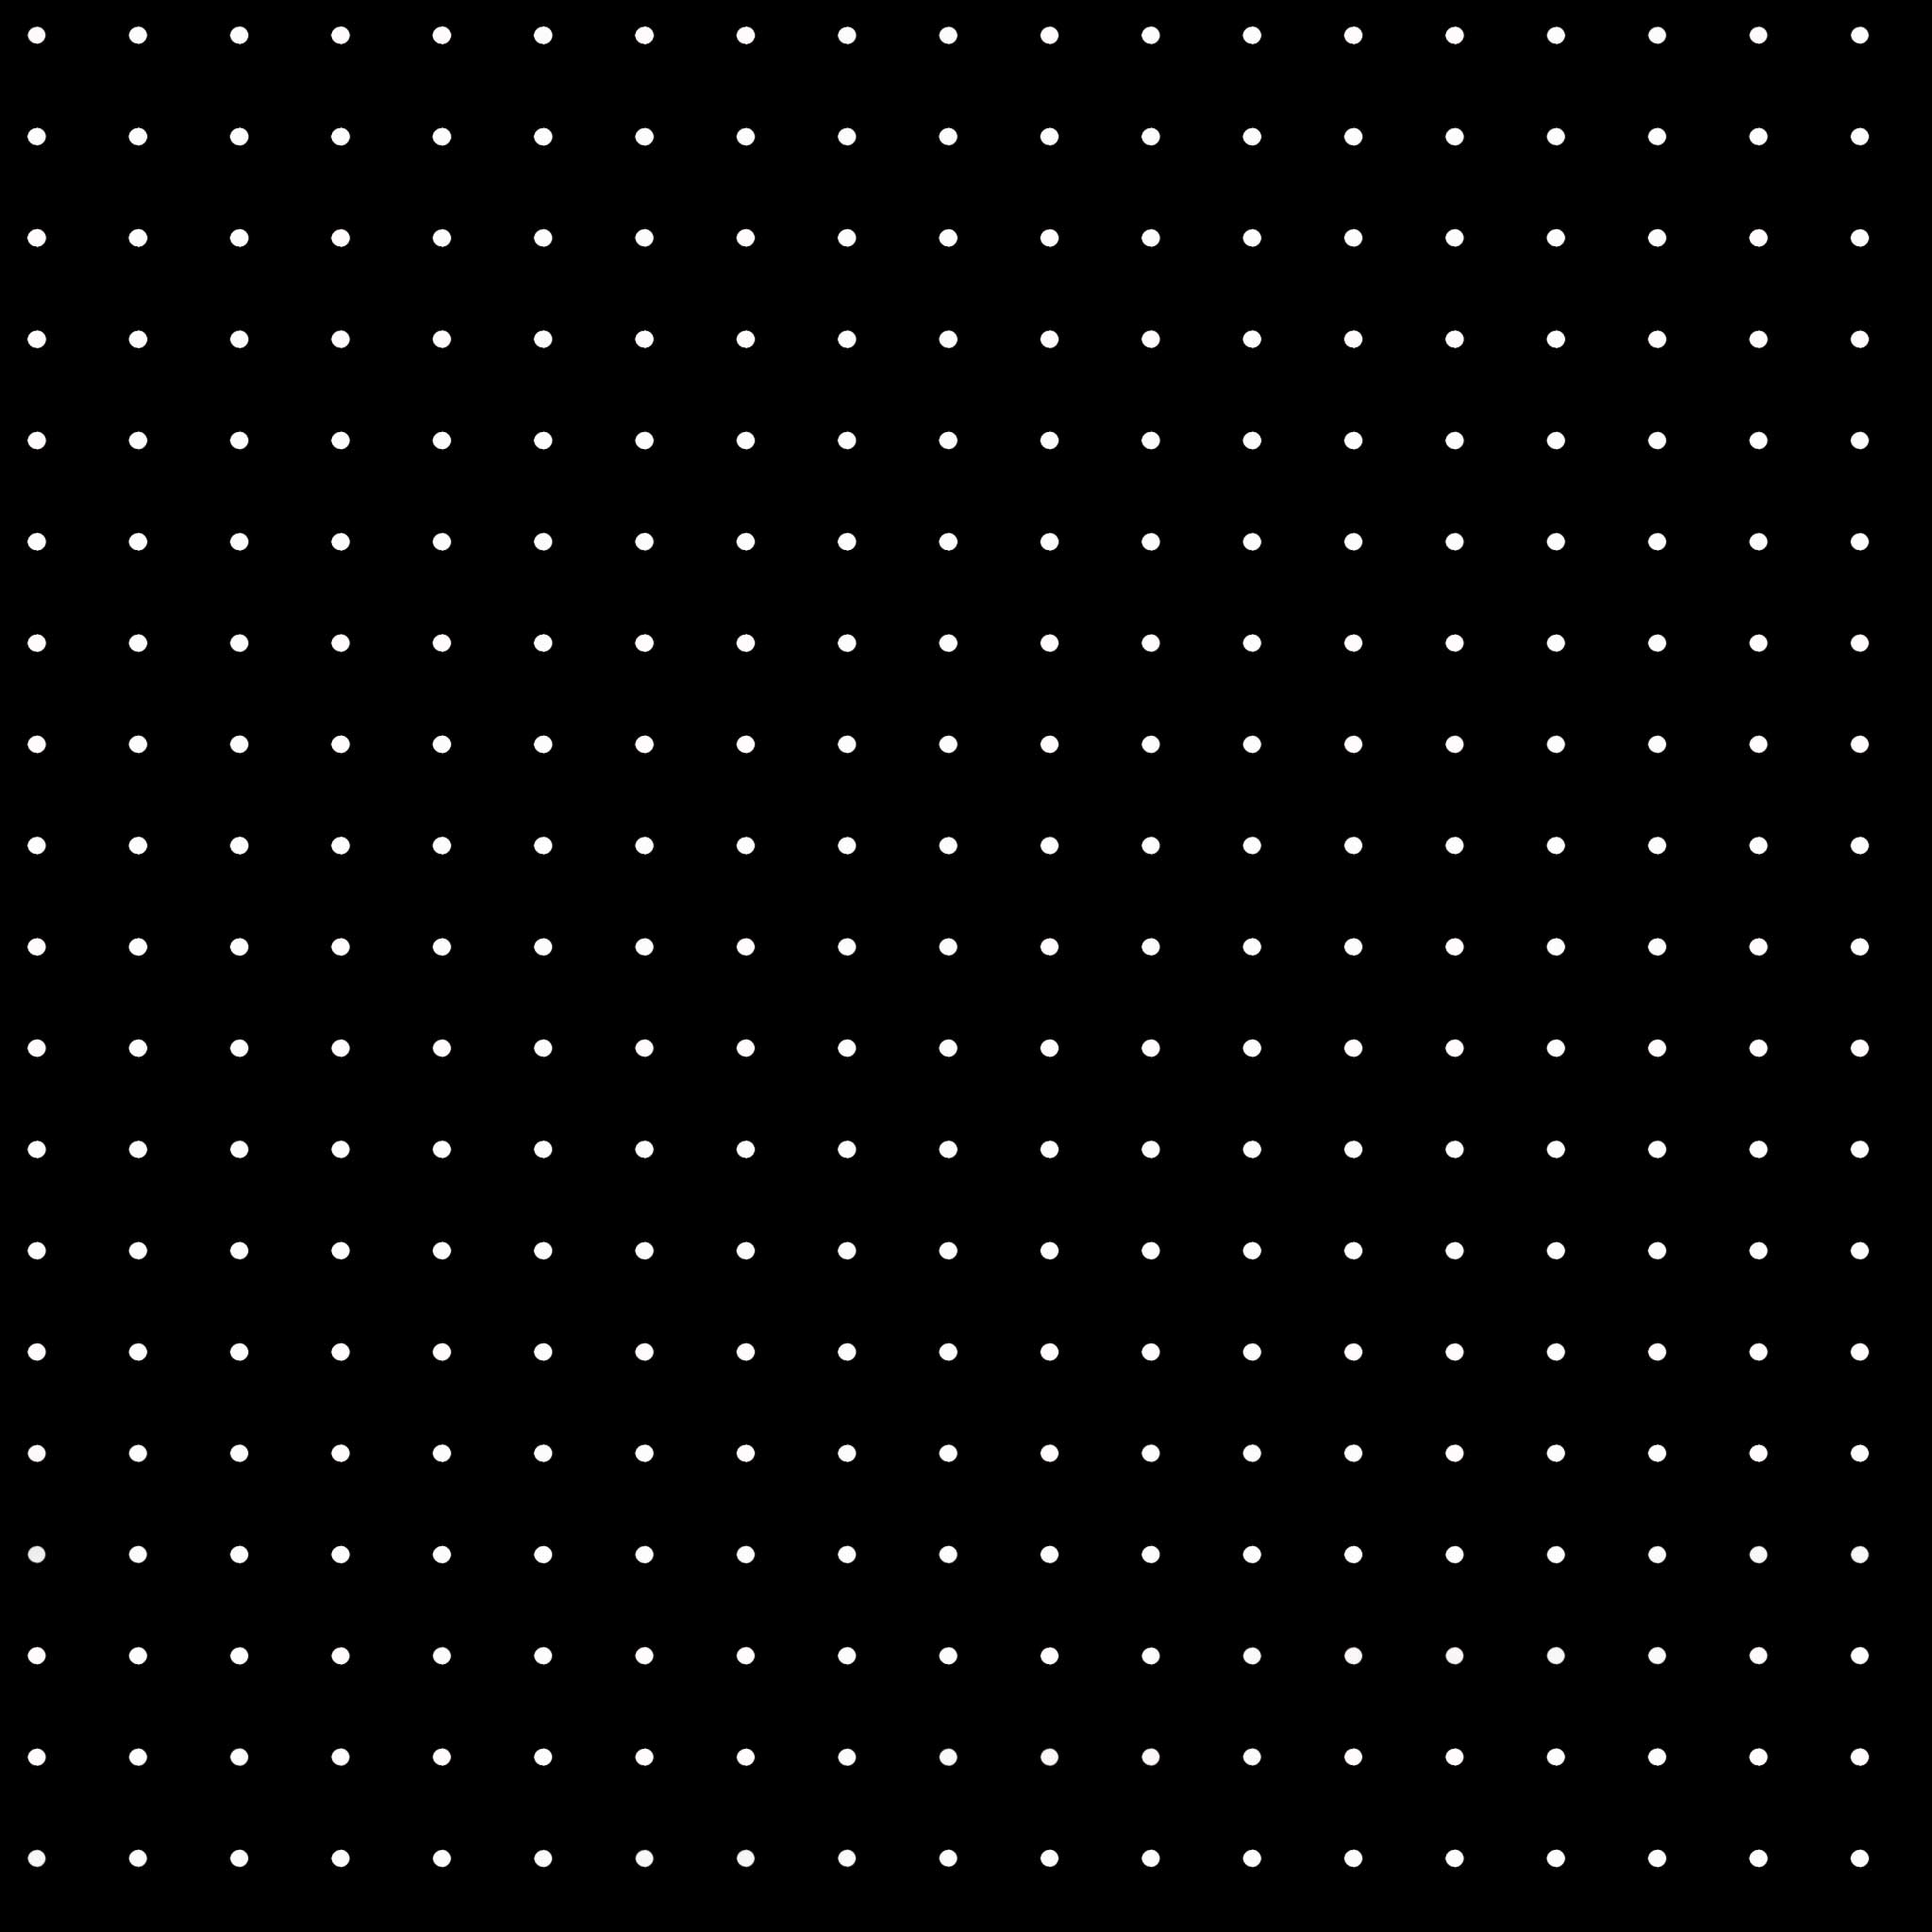 Dot Grid Procreate Brush - halfapx